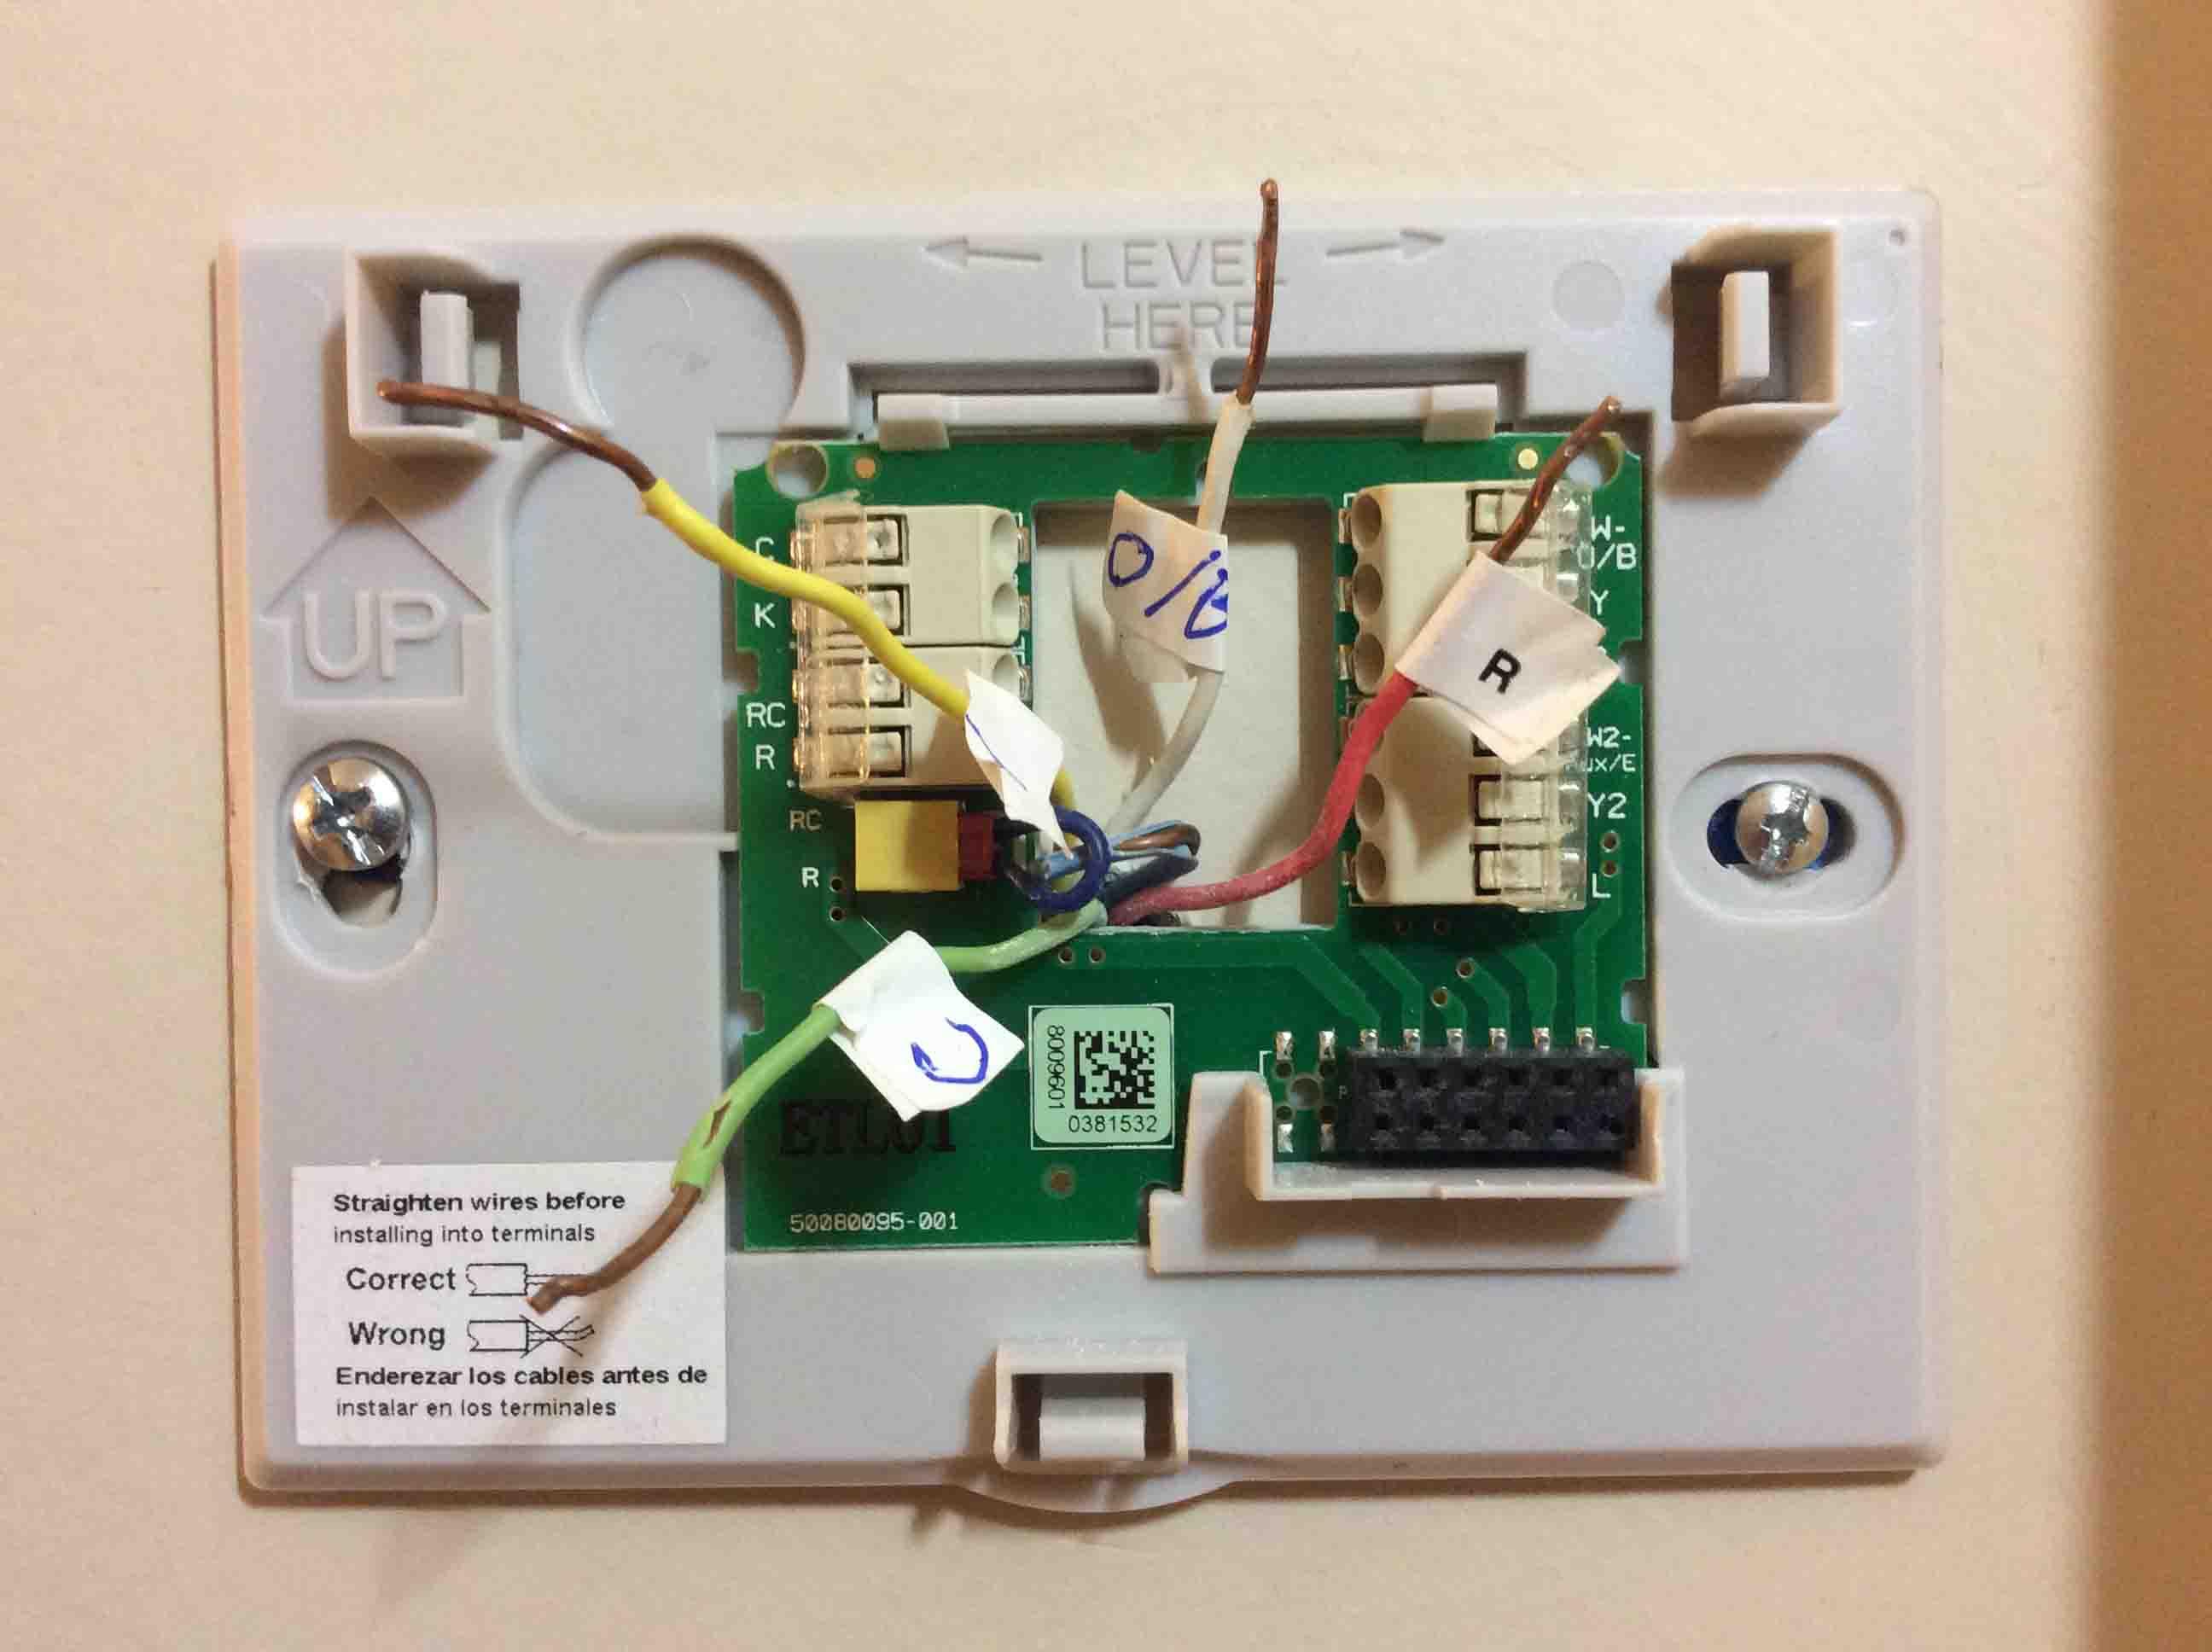 honeywell smart thermostat wiring instructions rth9580wfhoneywell rth9580wf thermostat wiring